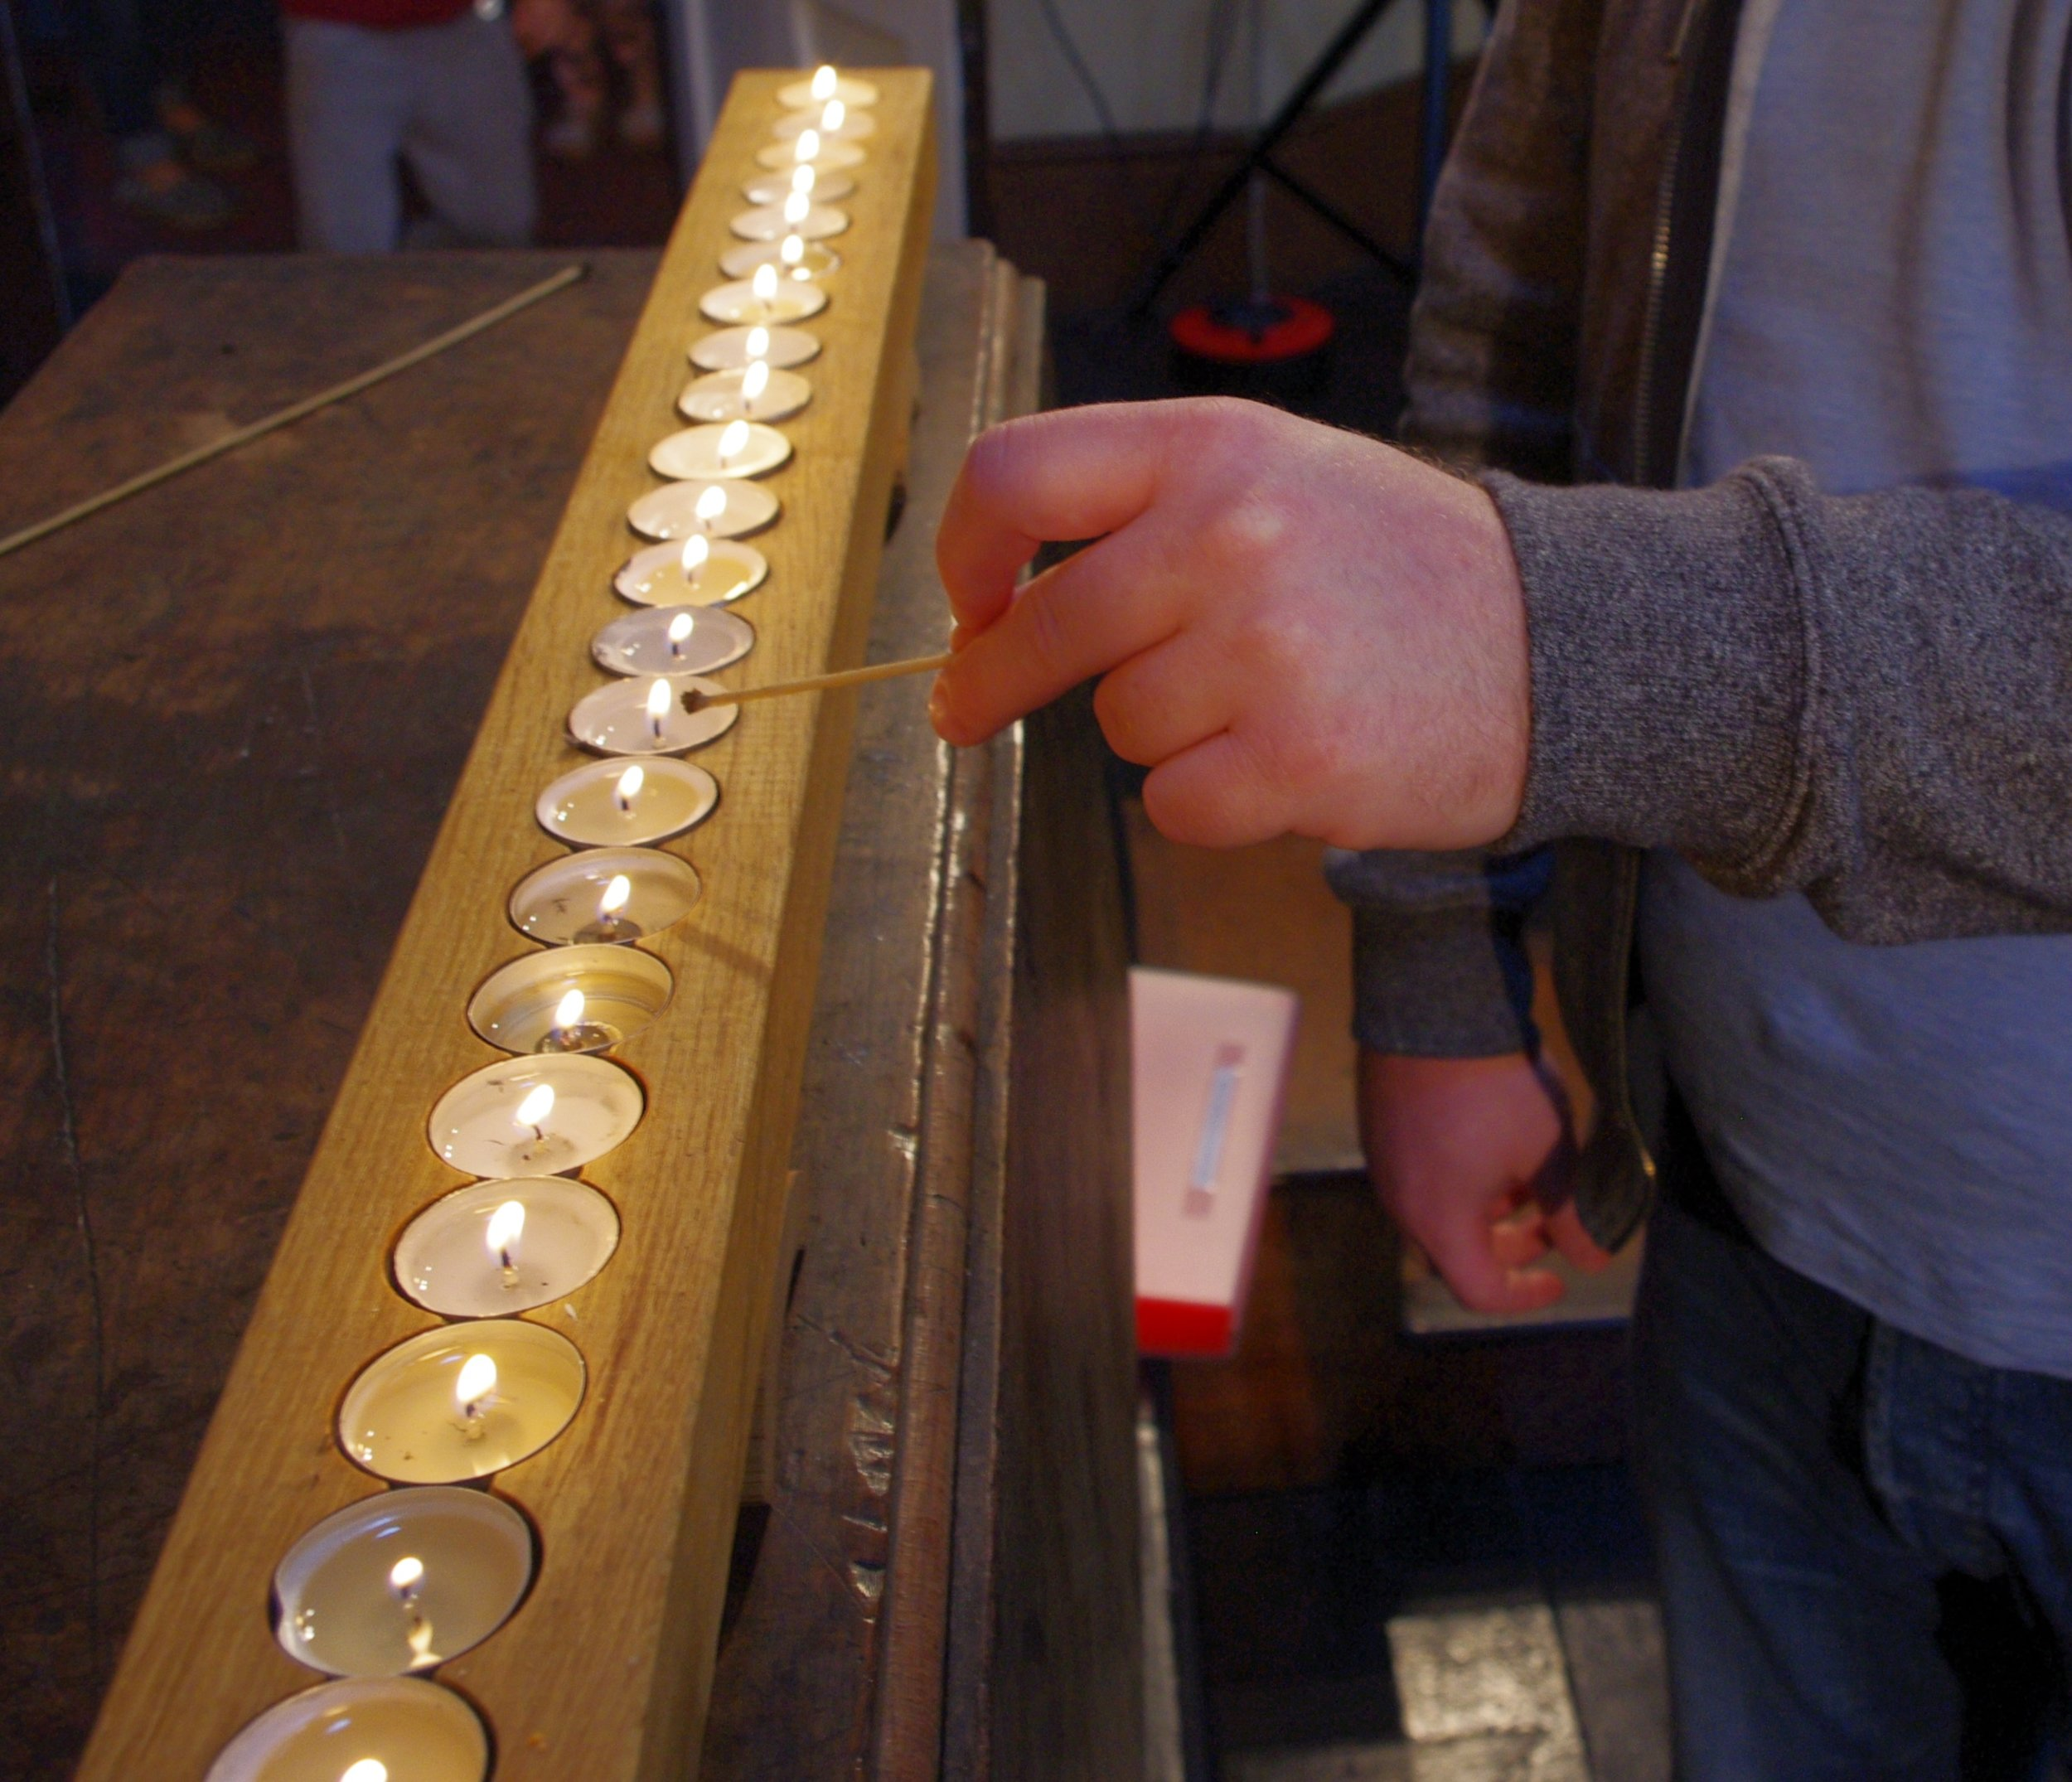 Toby lighting Chalice.JPG